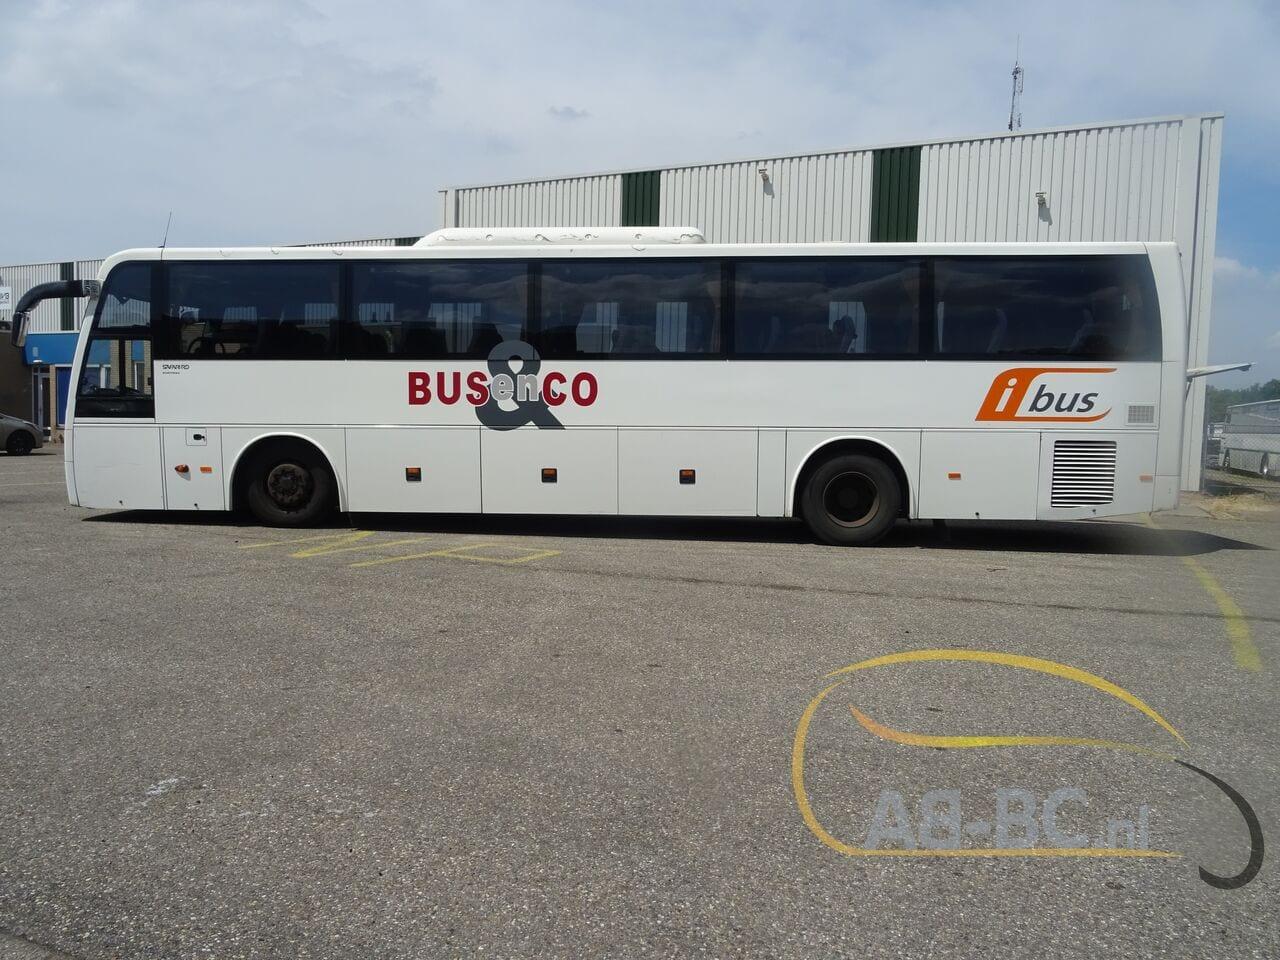 coach-busTEMSA-Safari-RD-DAF-Motor-53-Seats-Euro-5---1623932833972225833_big_84a993d90bcd20dd2524ff748cbe3309--21061715155620919600